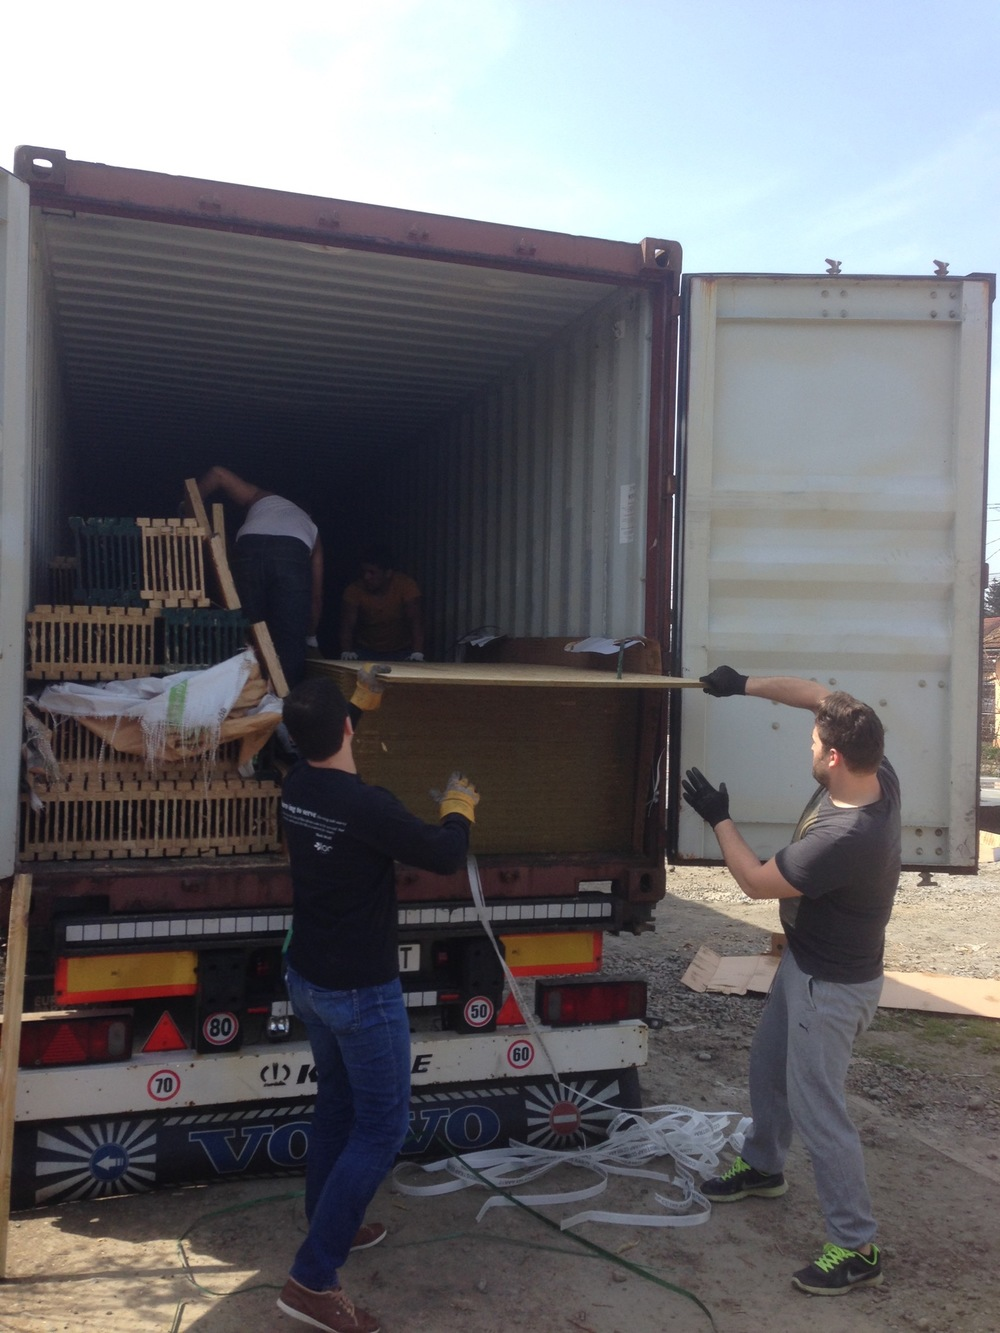 Unloading the lumber.